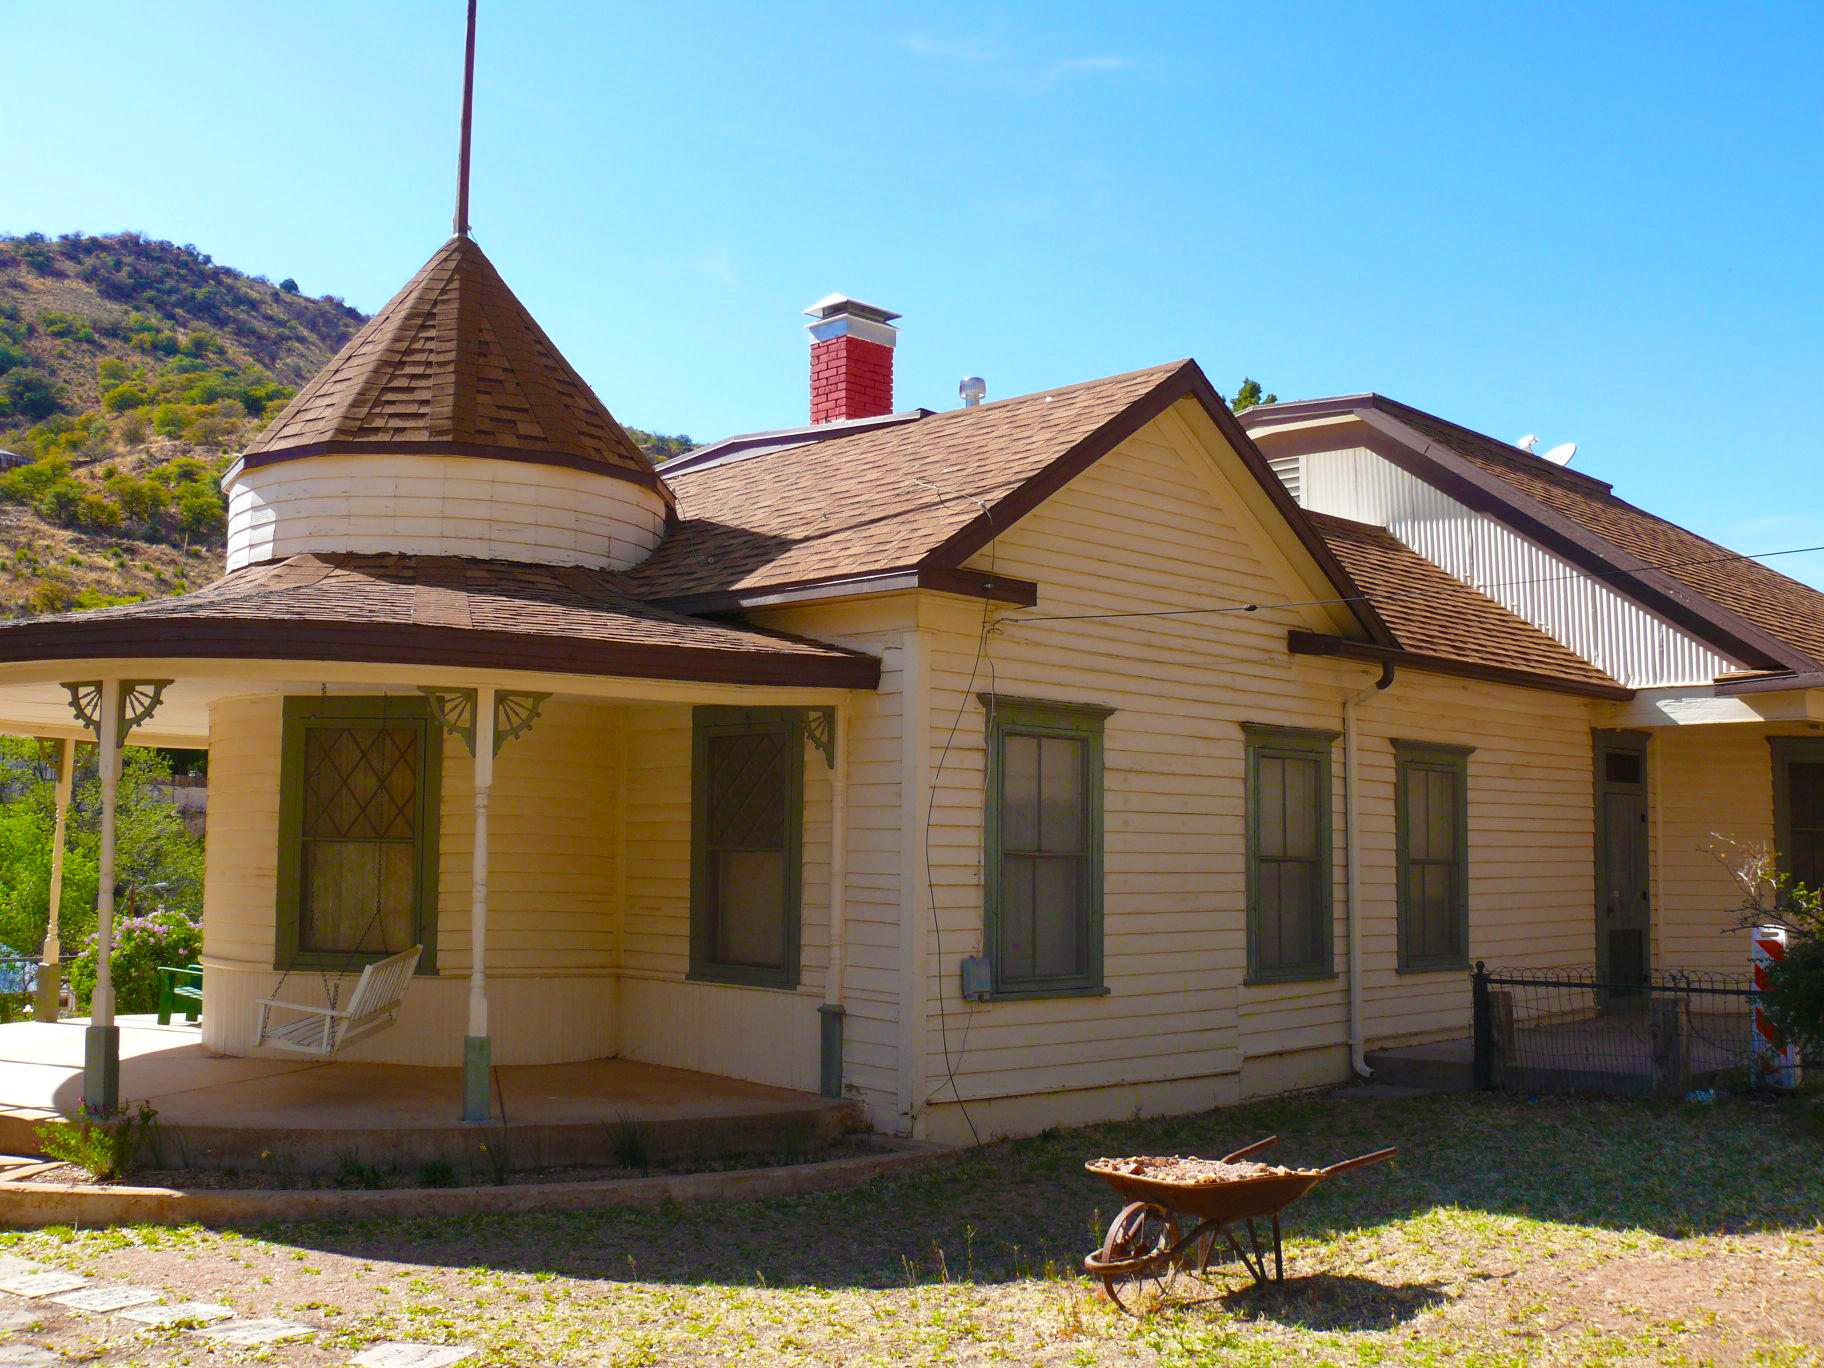 The Muheim Museum Heritage House.